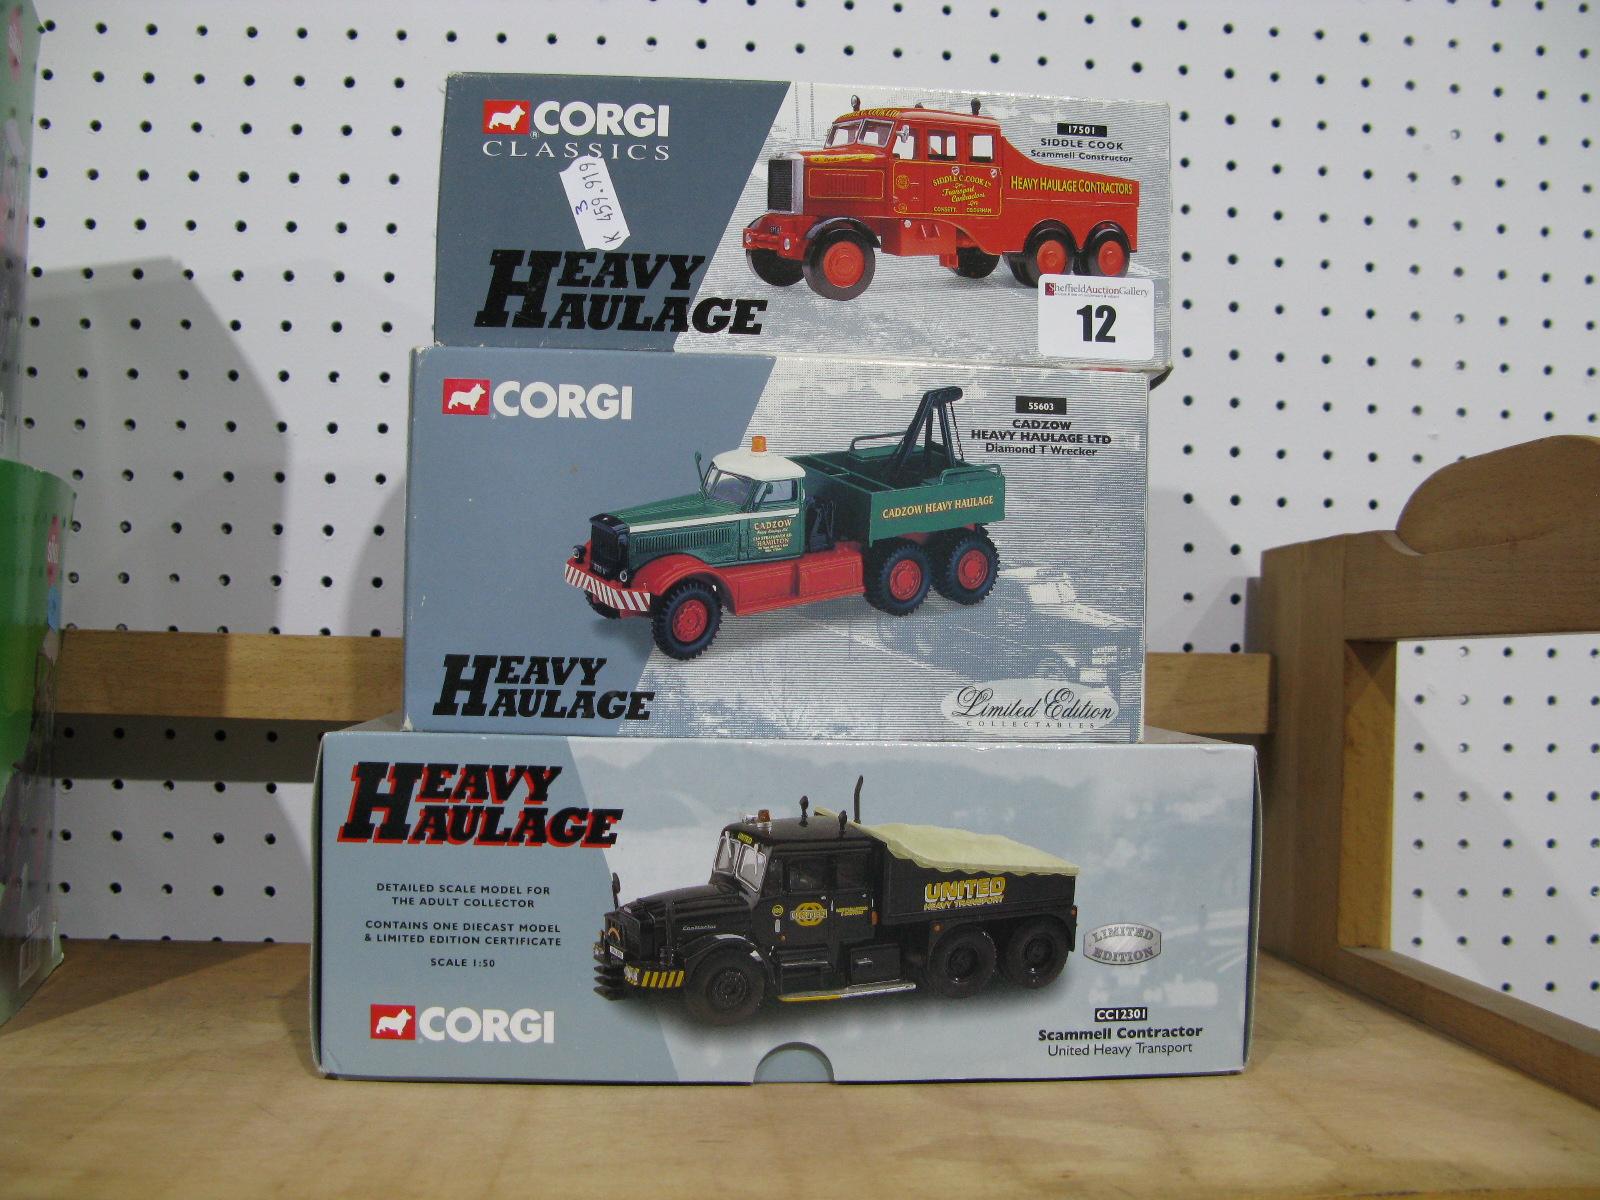 Lot 12 - Three 1/50th Scale Diecast Model Trucks By Corgi, #cc12301 Scammel contractor, united heavy